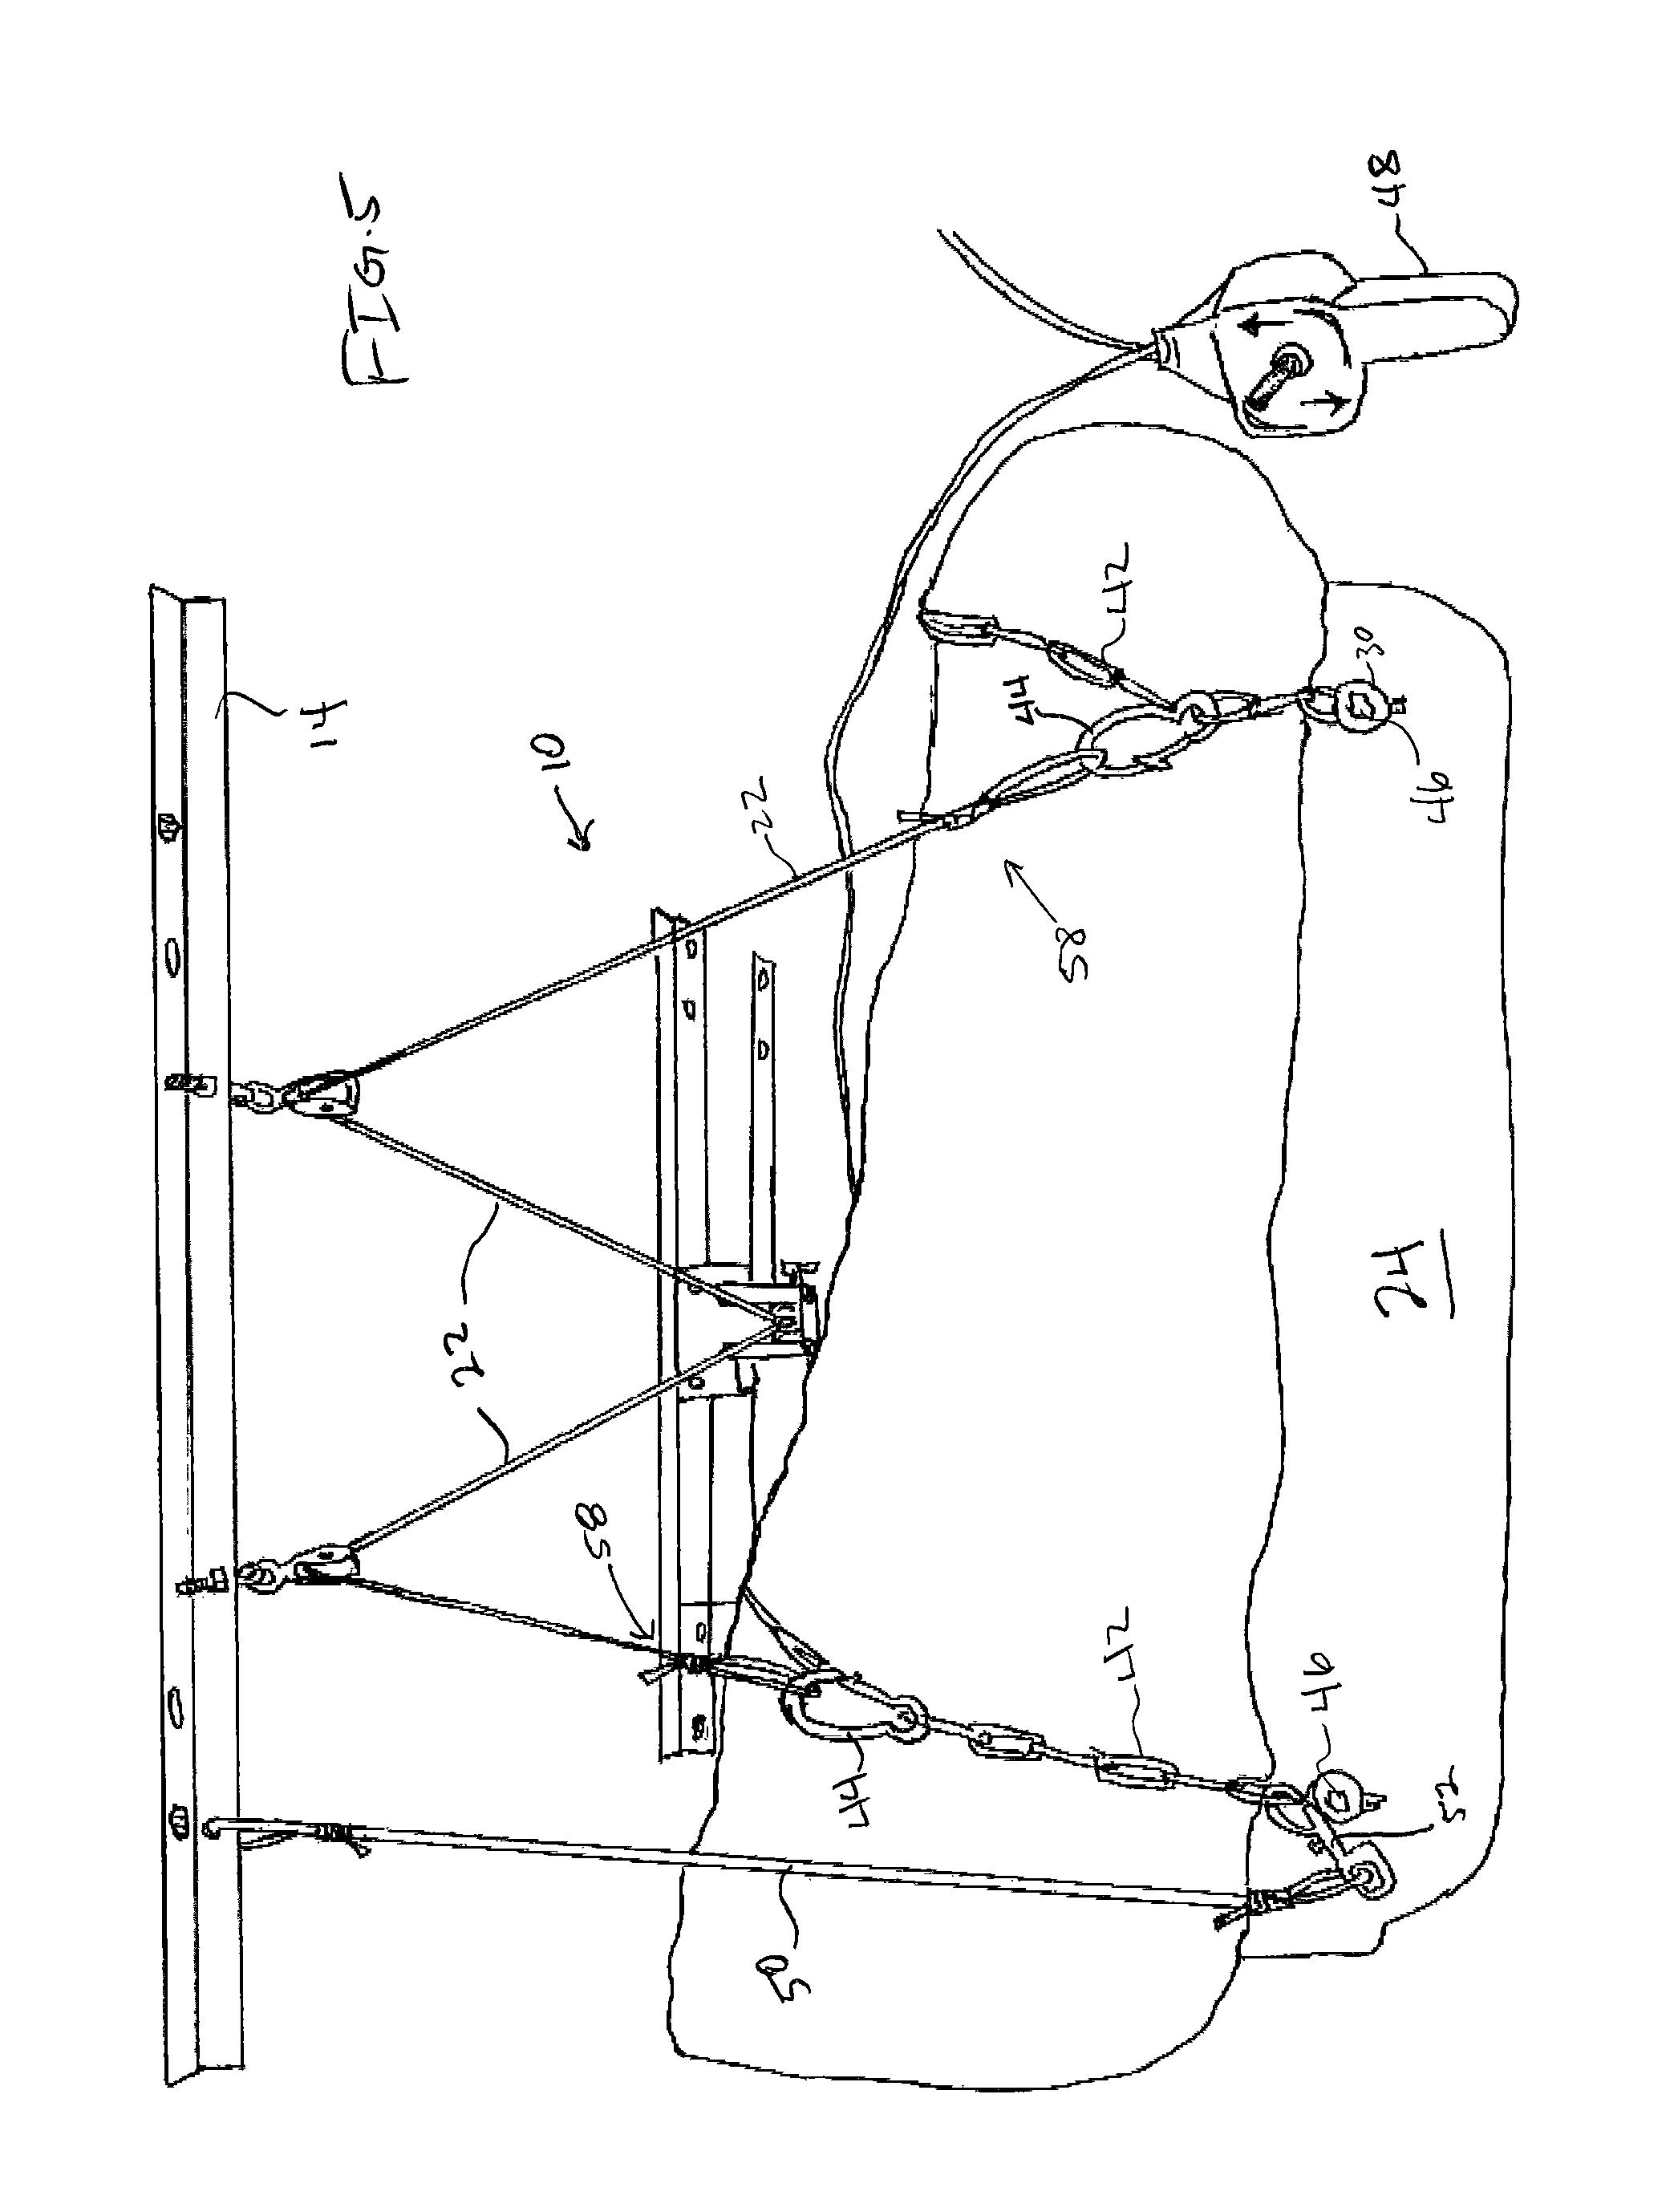 shaw box hoist wiring diagram get wiring diagram free